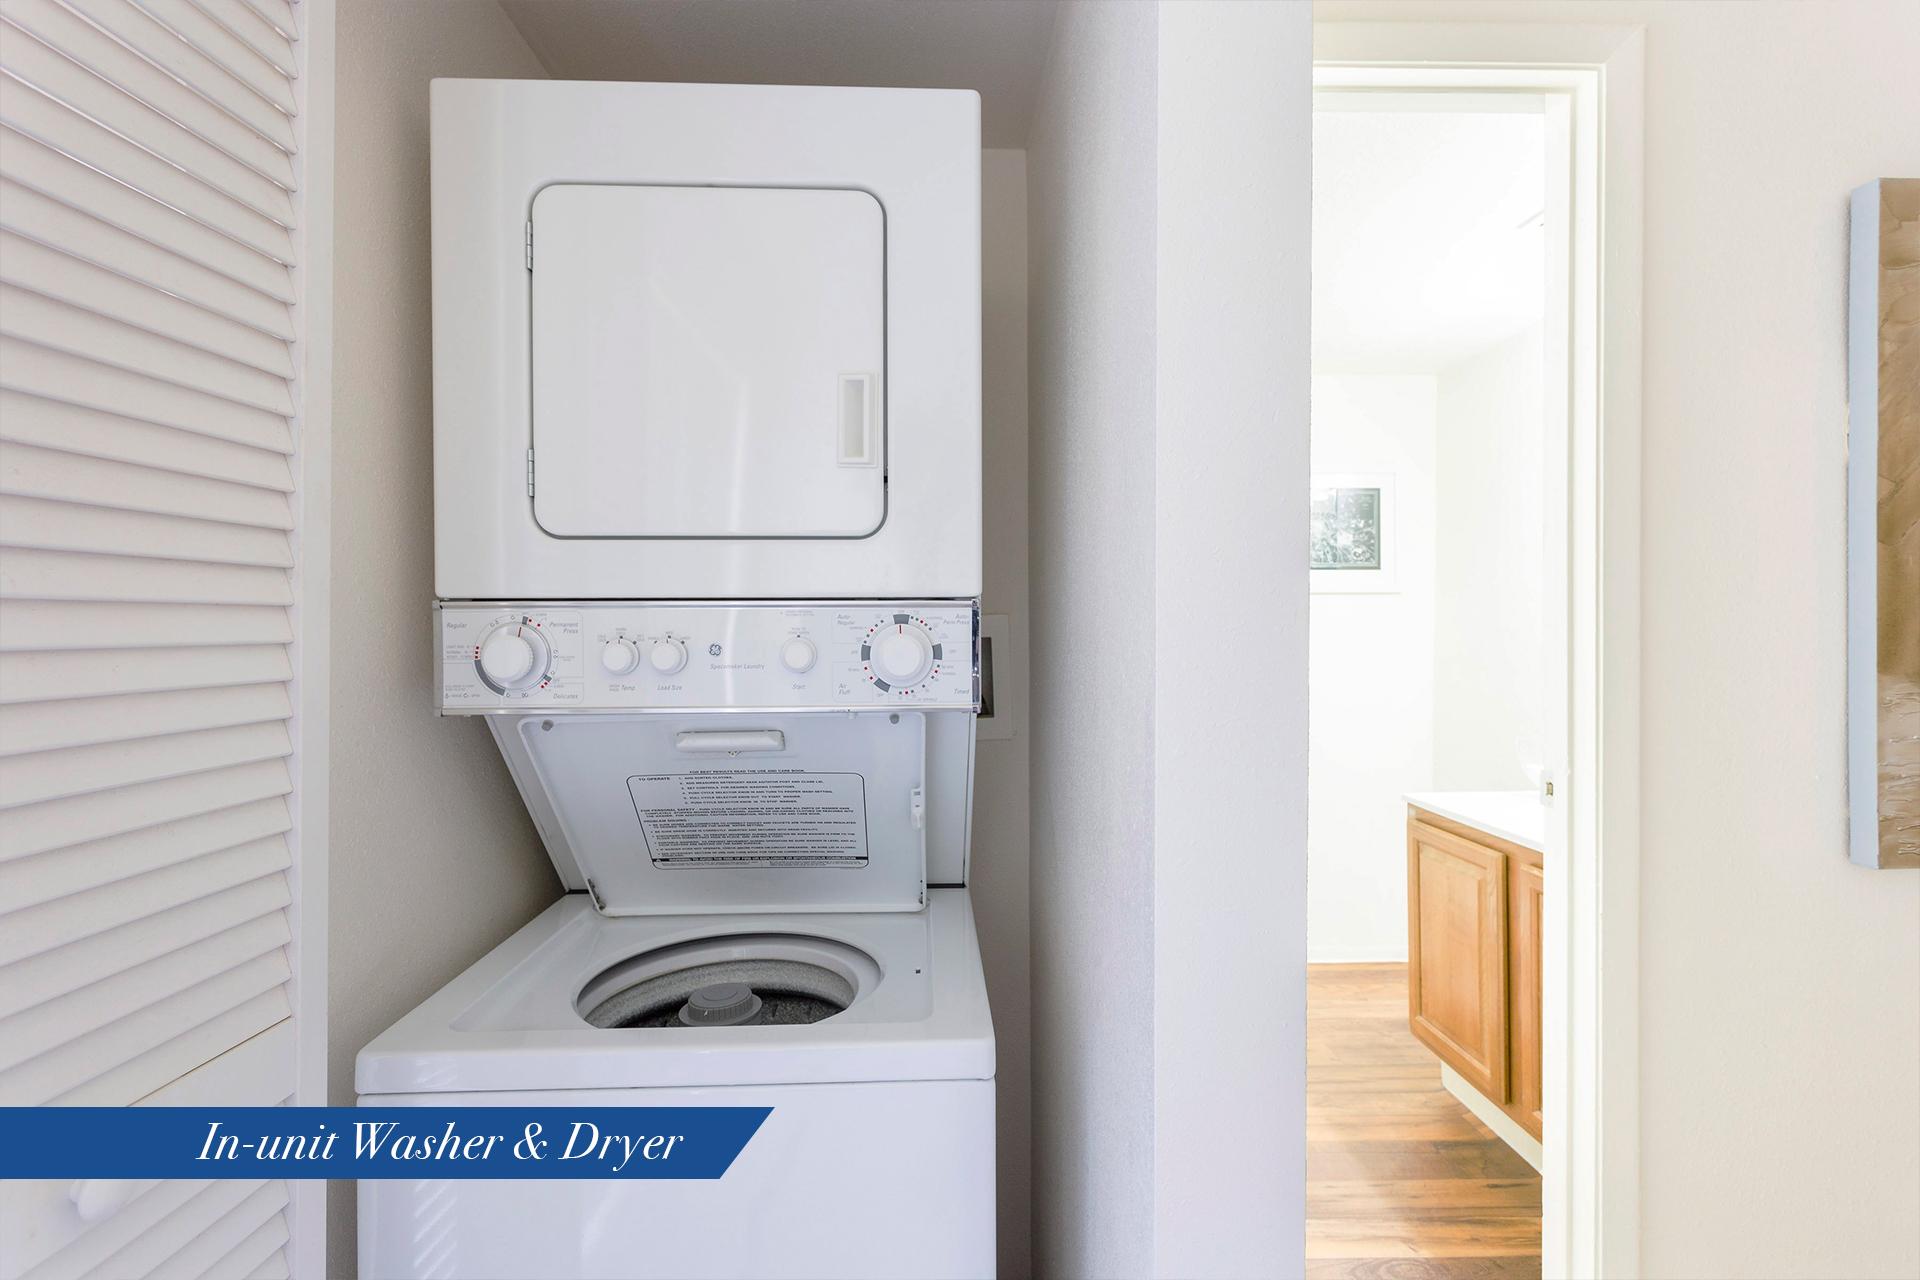 Iwp-washerdryer